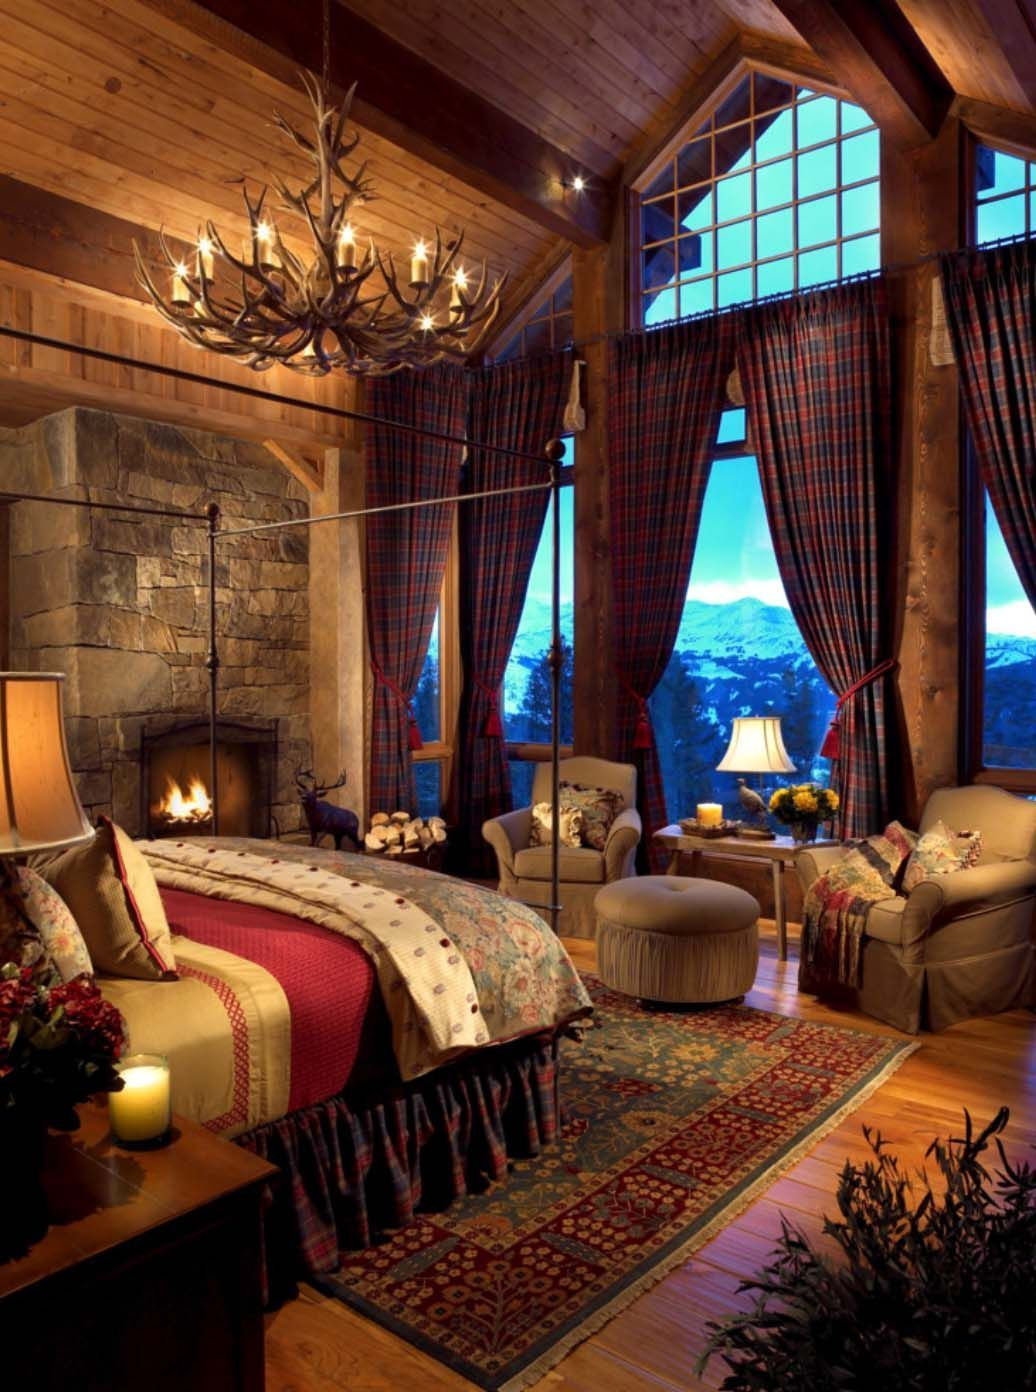 cabin furniture ideas. Best Cabin Design Ideas For Inspiration - Fancytecture Furniture O